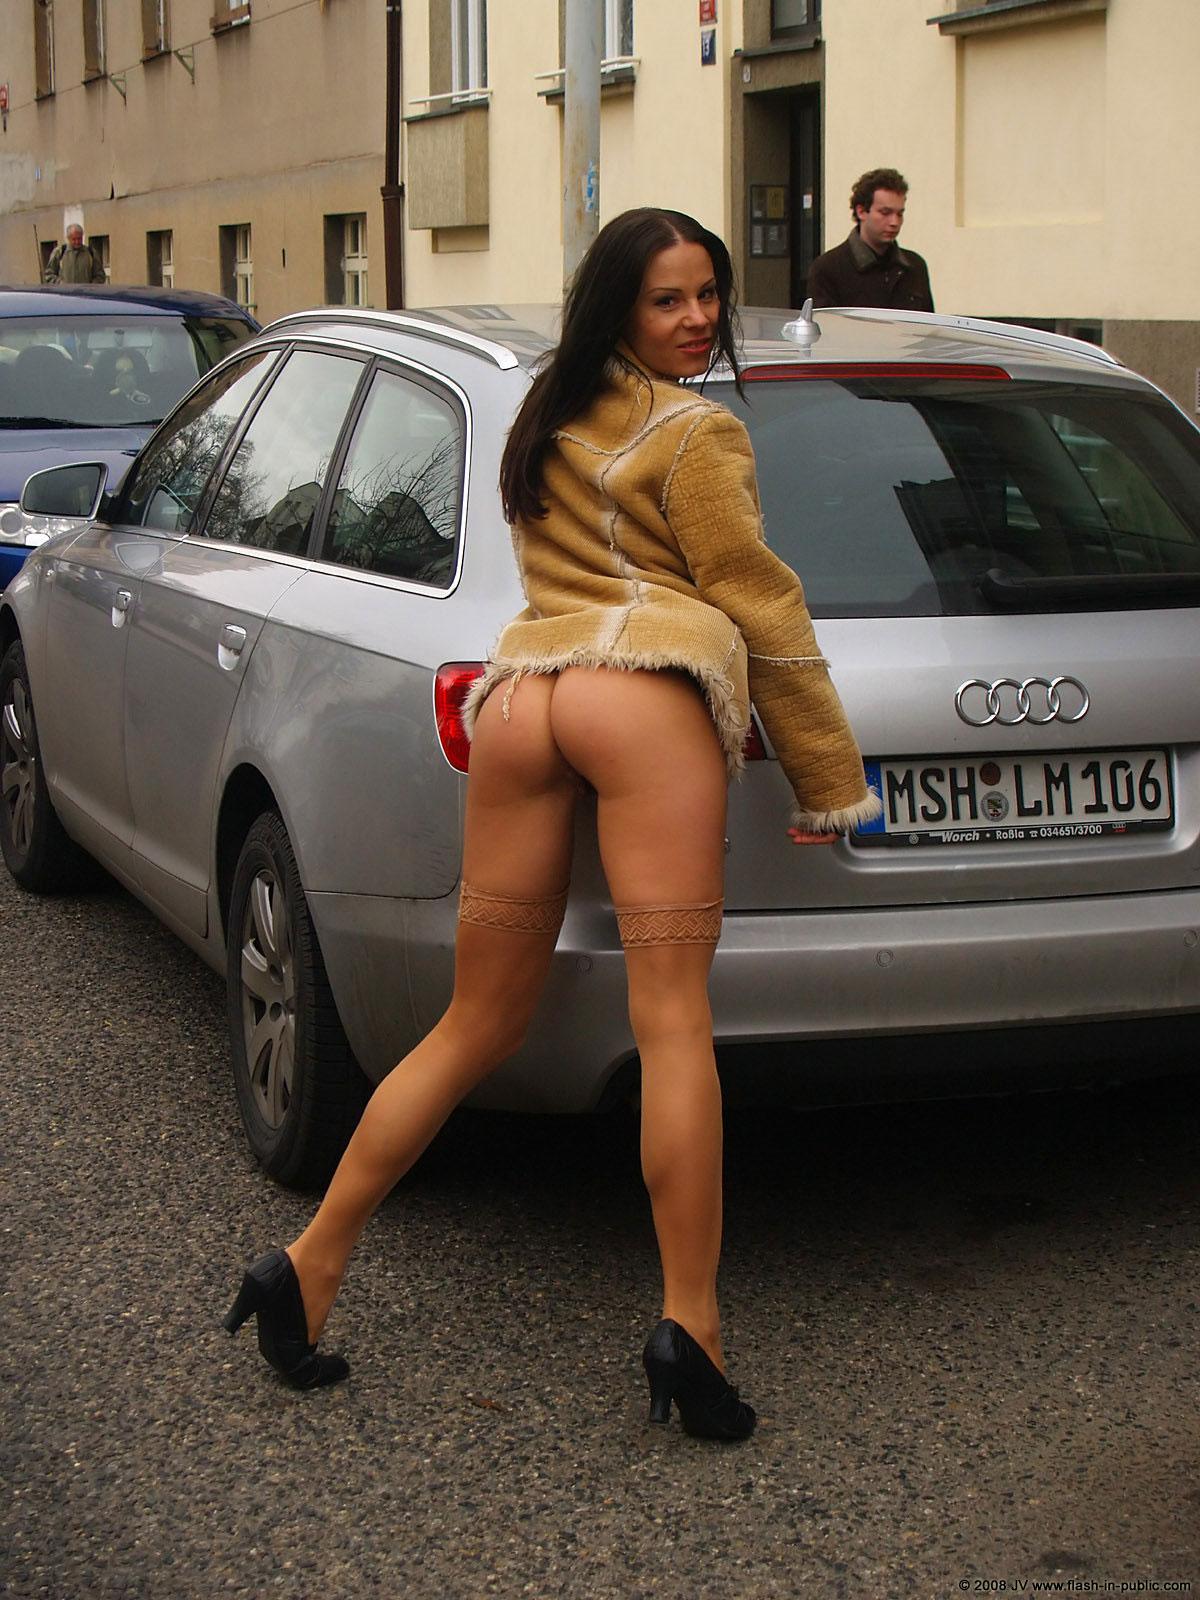 alexandra-g-bottomless-stockings-flash-in-public-31